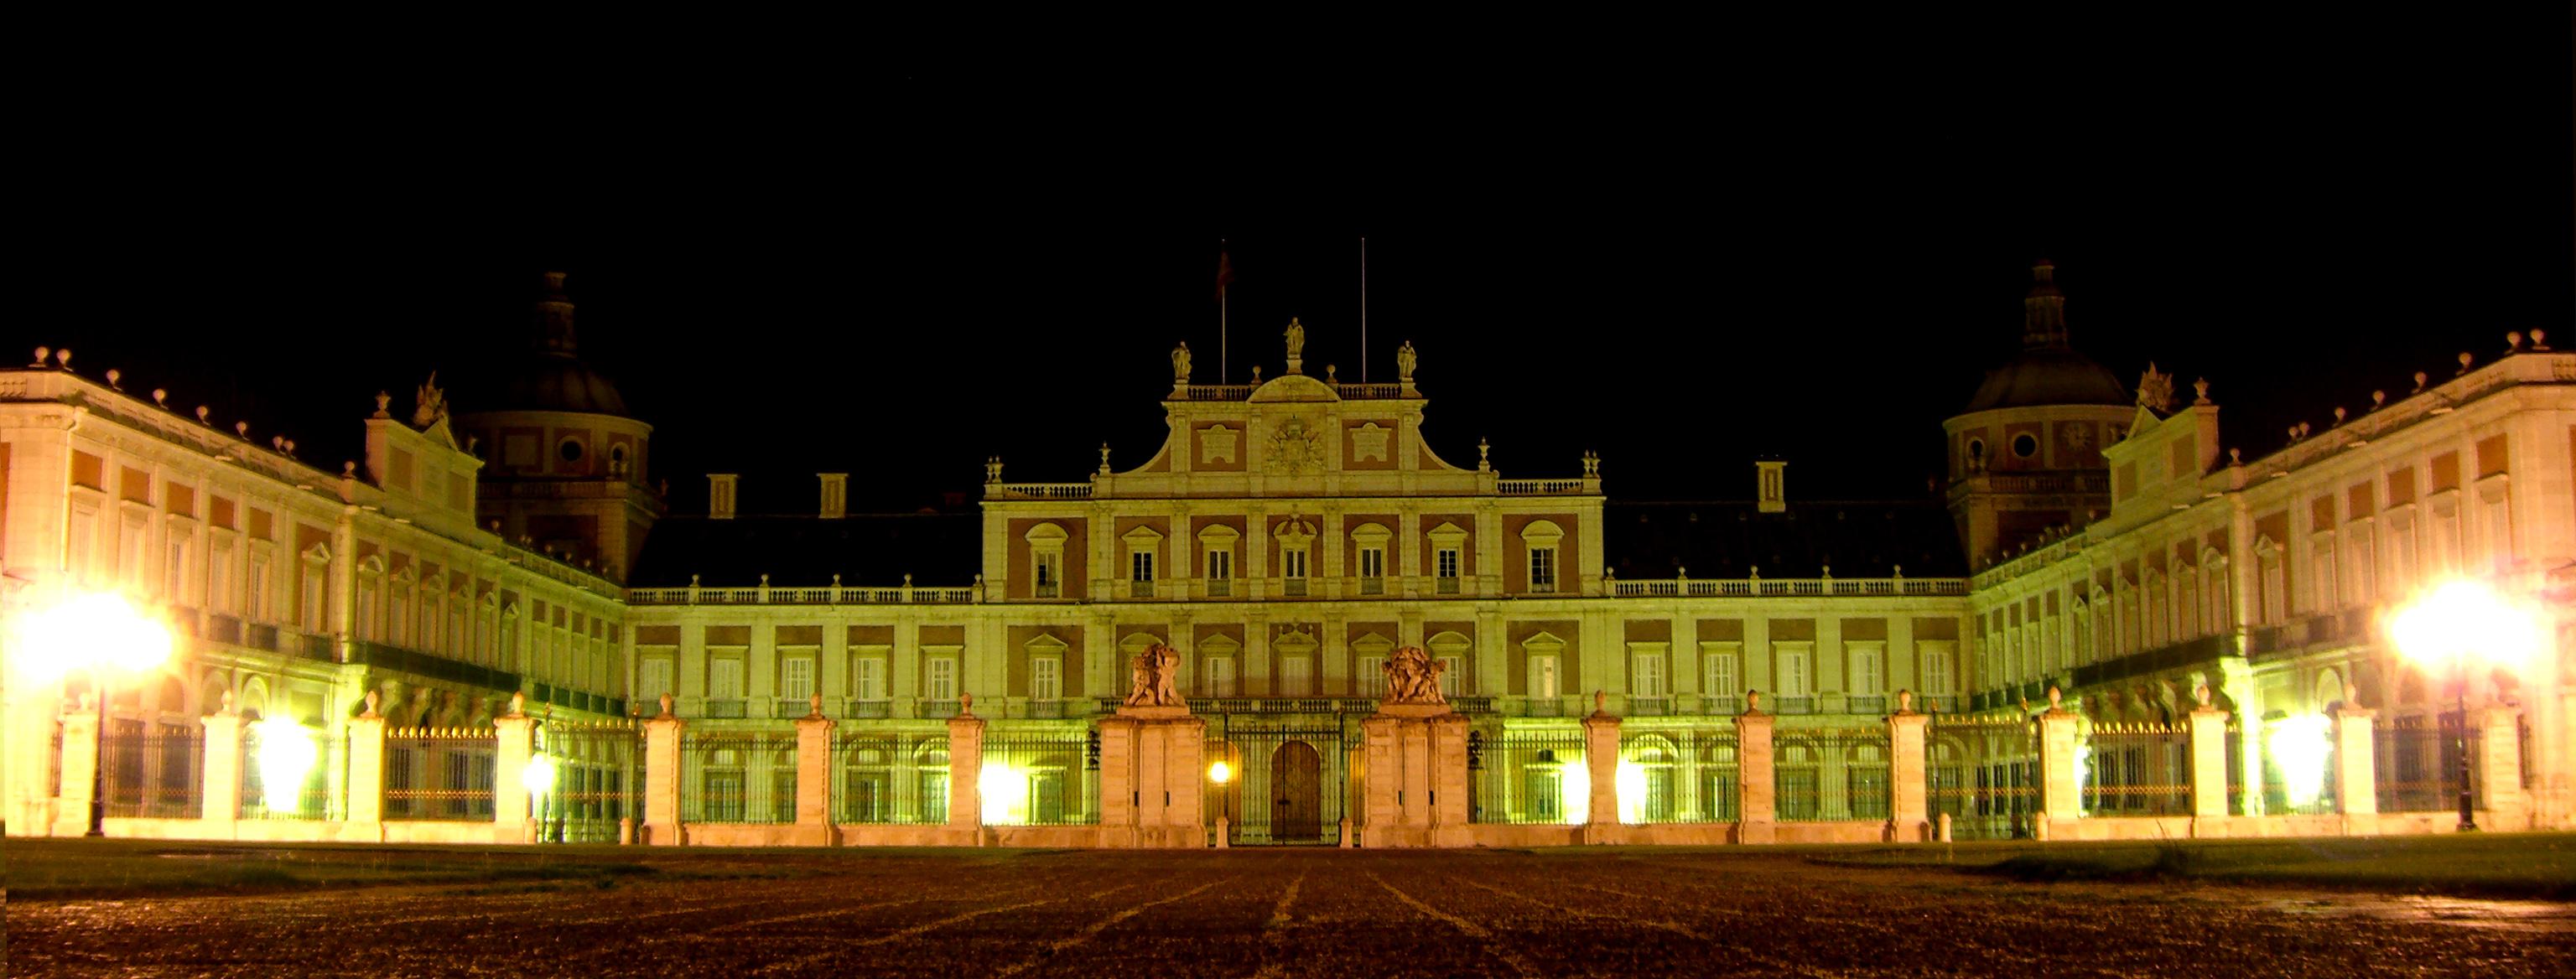 http://upload.wikimedia.org/wikipedia/commons/9/9f/Palacio_Real_de_Aranjuez_-_Exterior_01.jpg